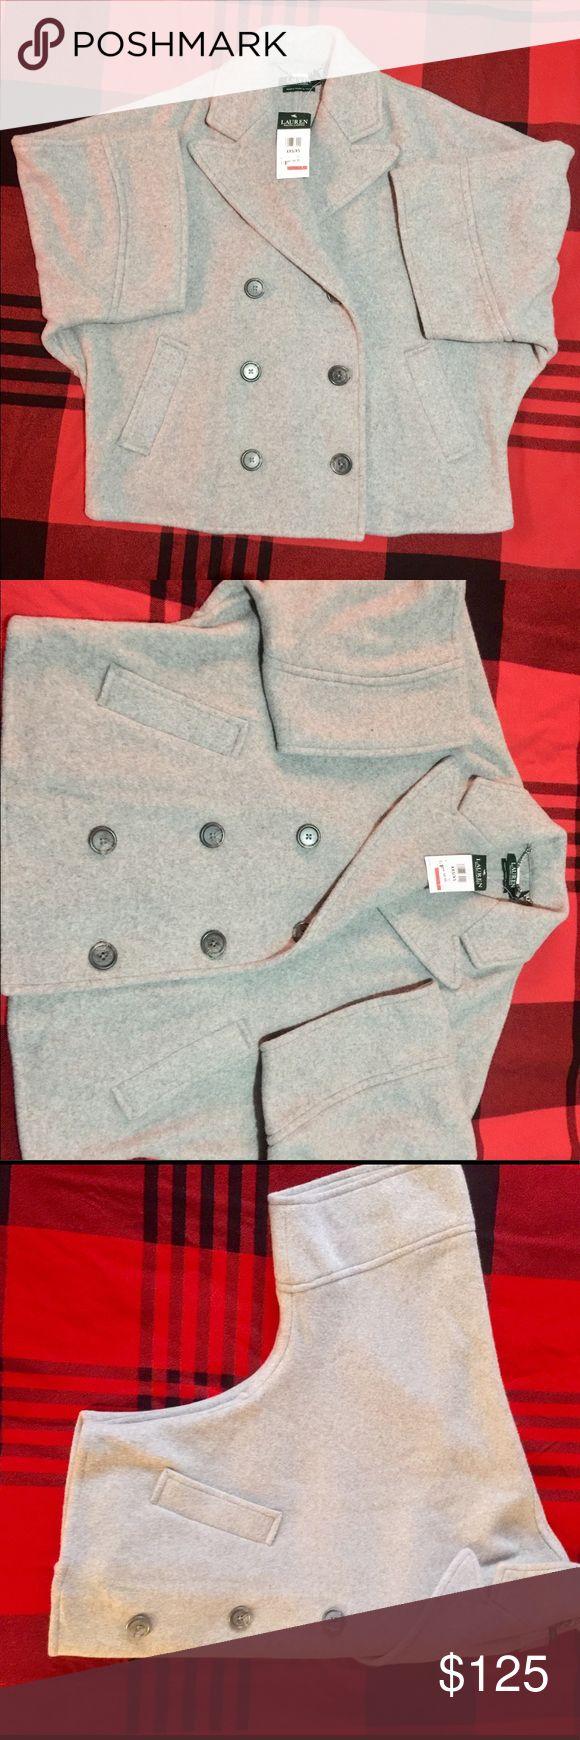 RALPH LAUREN RALPH LAUREN BRAND NEW WITH TAGS JACKET Ralph Lauren Jackets & Coats Utility Jackets